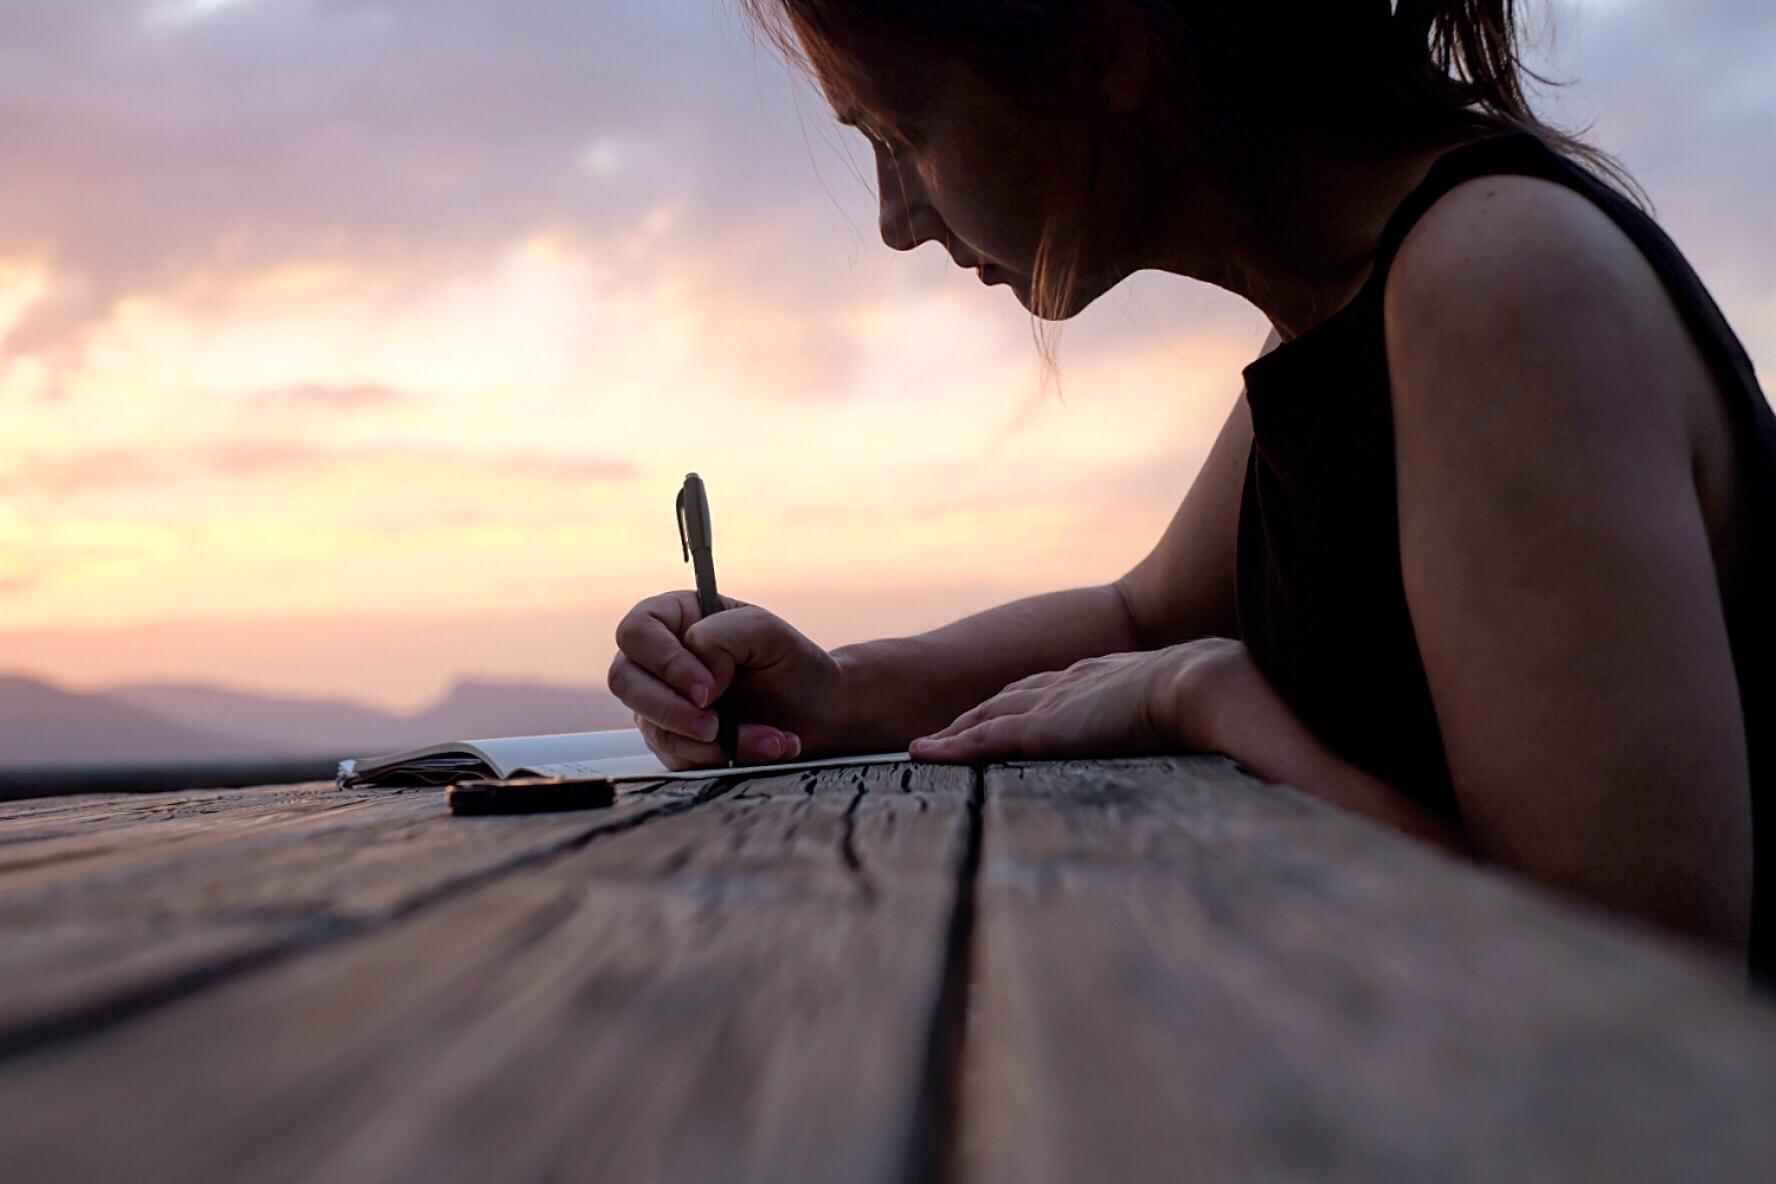 journal writing on Camino Aragones, Arres, sunset